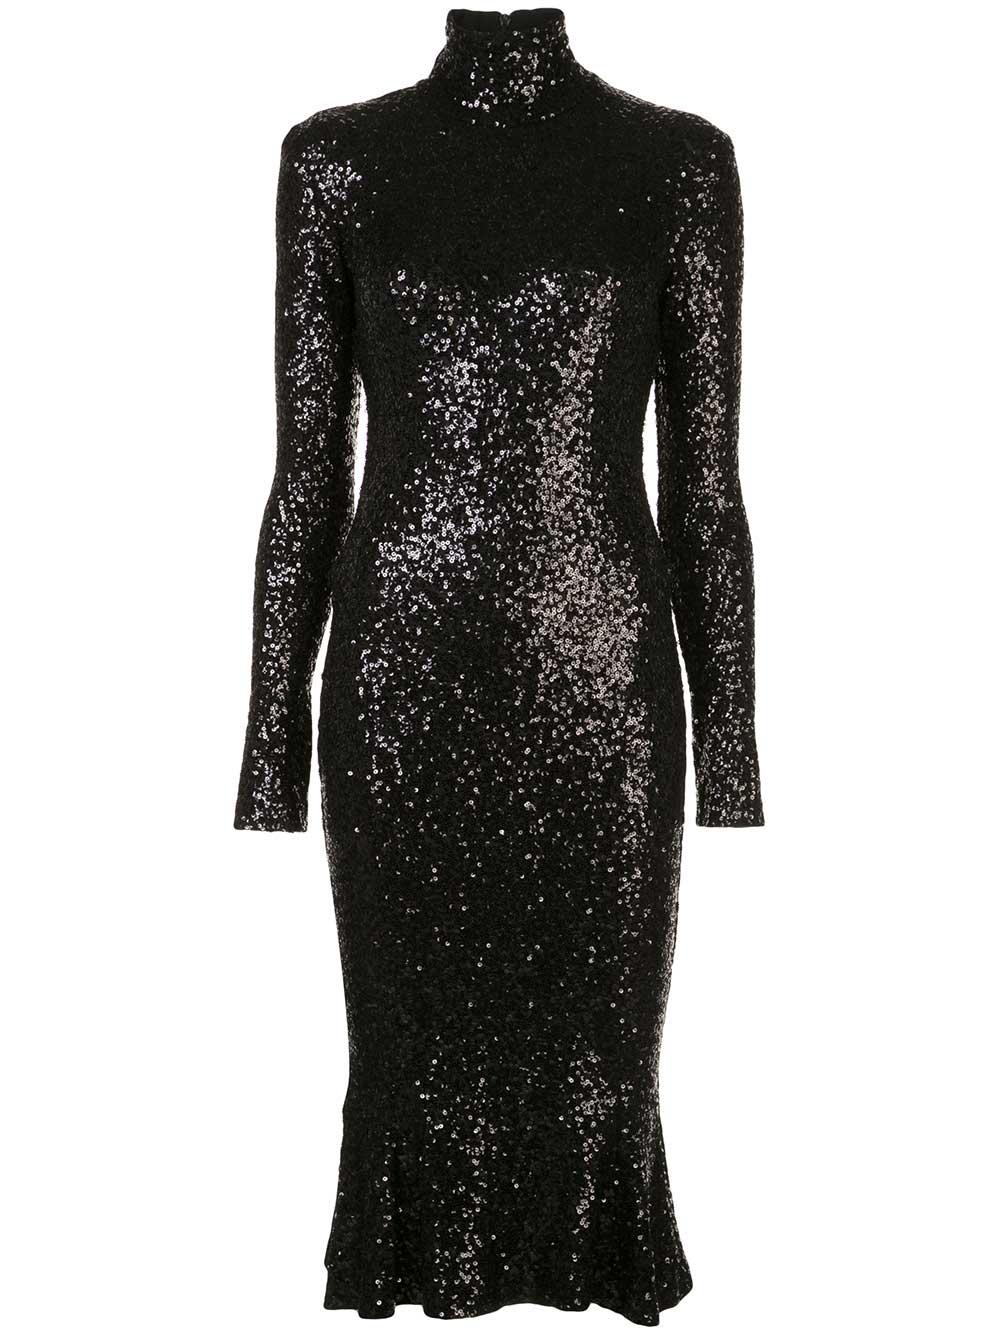 Sequin Long Sleeve Fishtail Dress Item # ST4293SQ151001